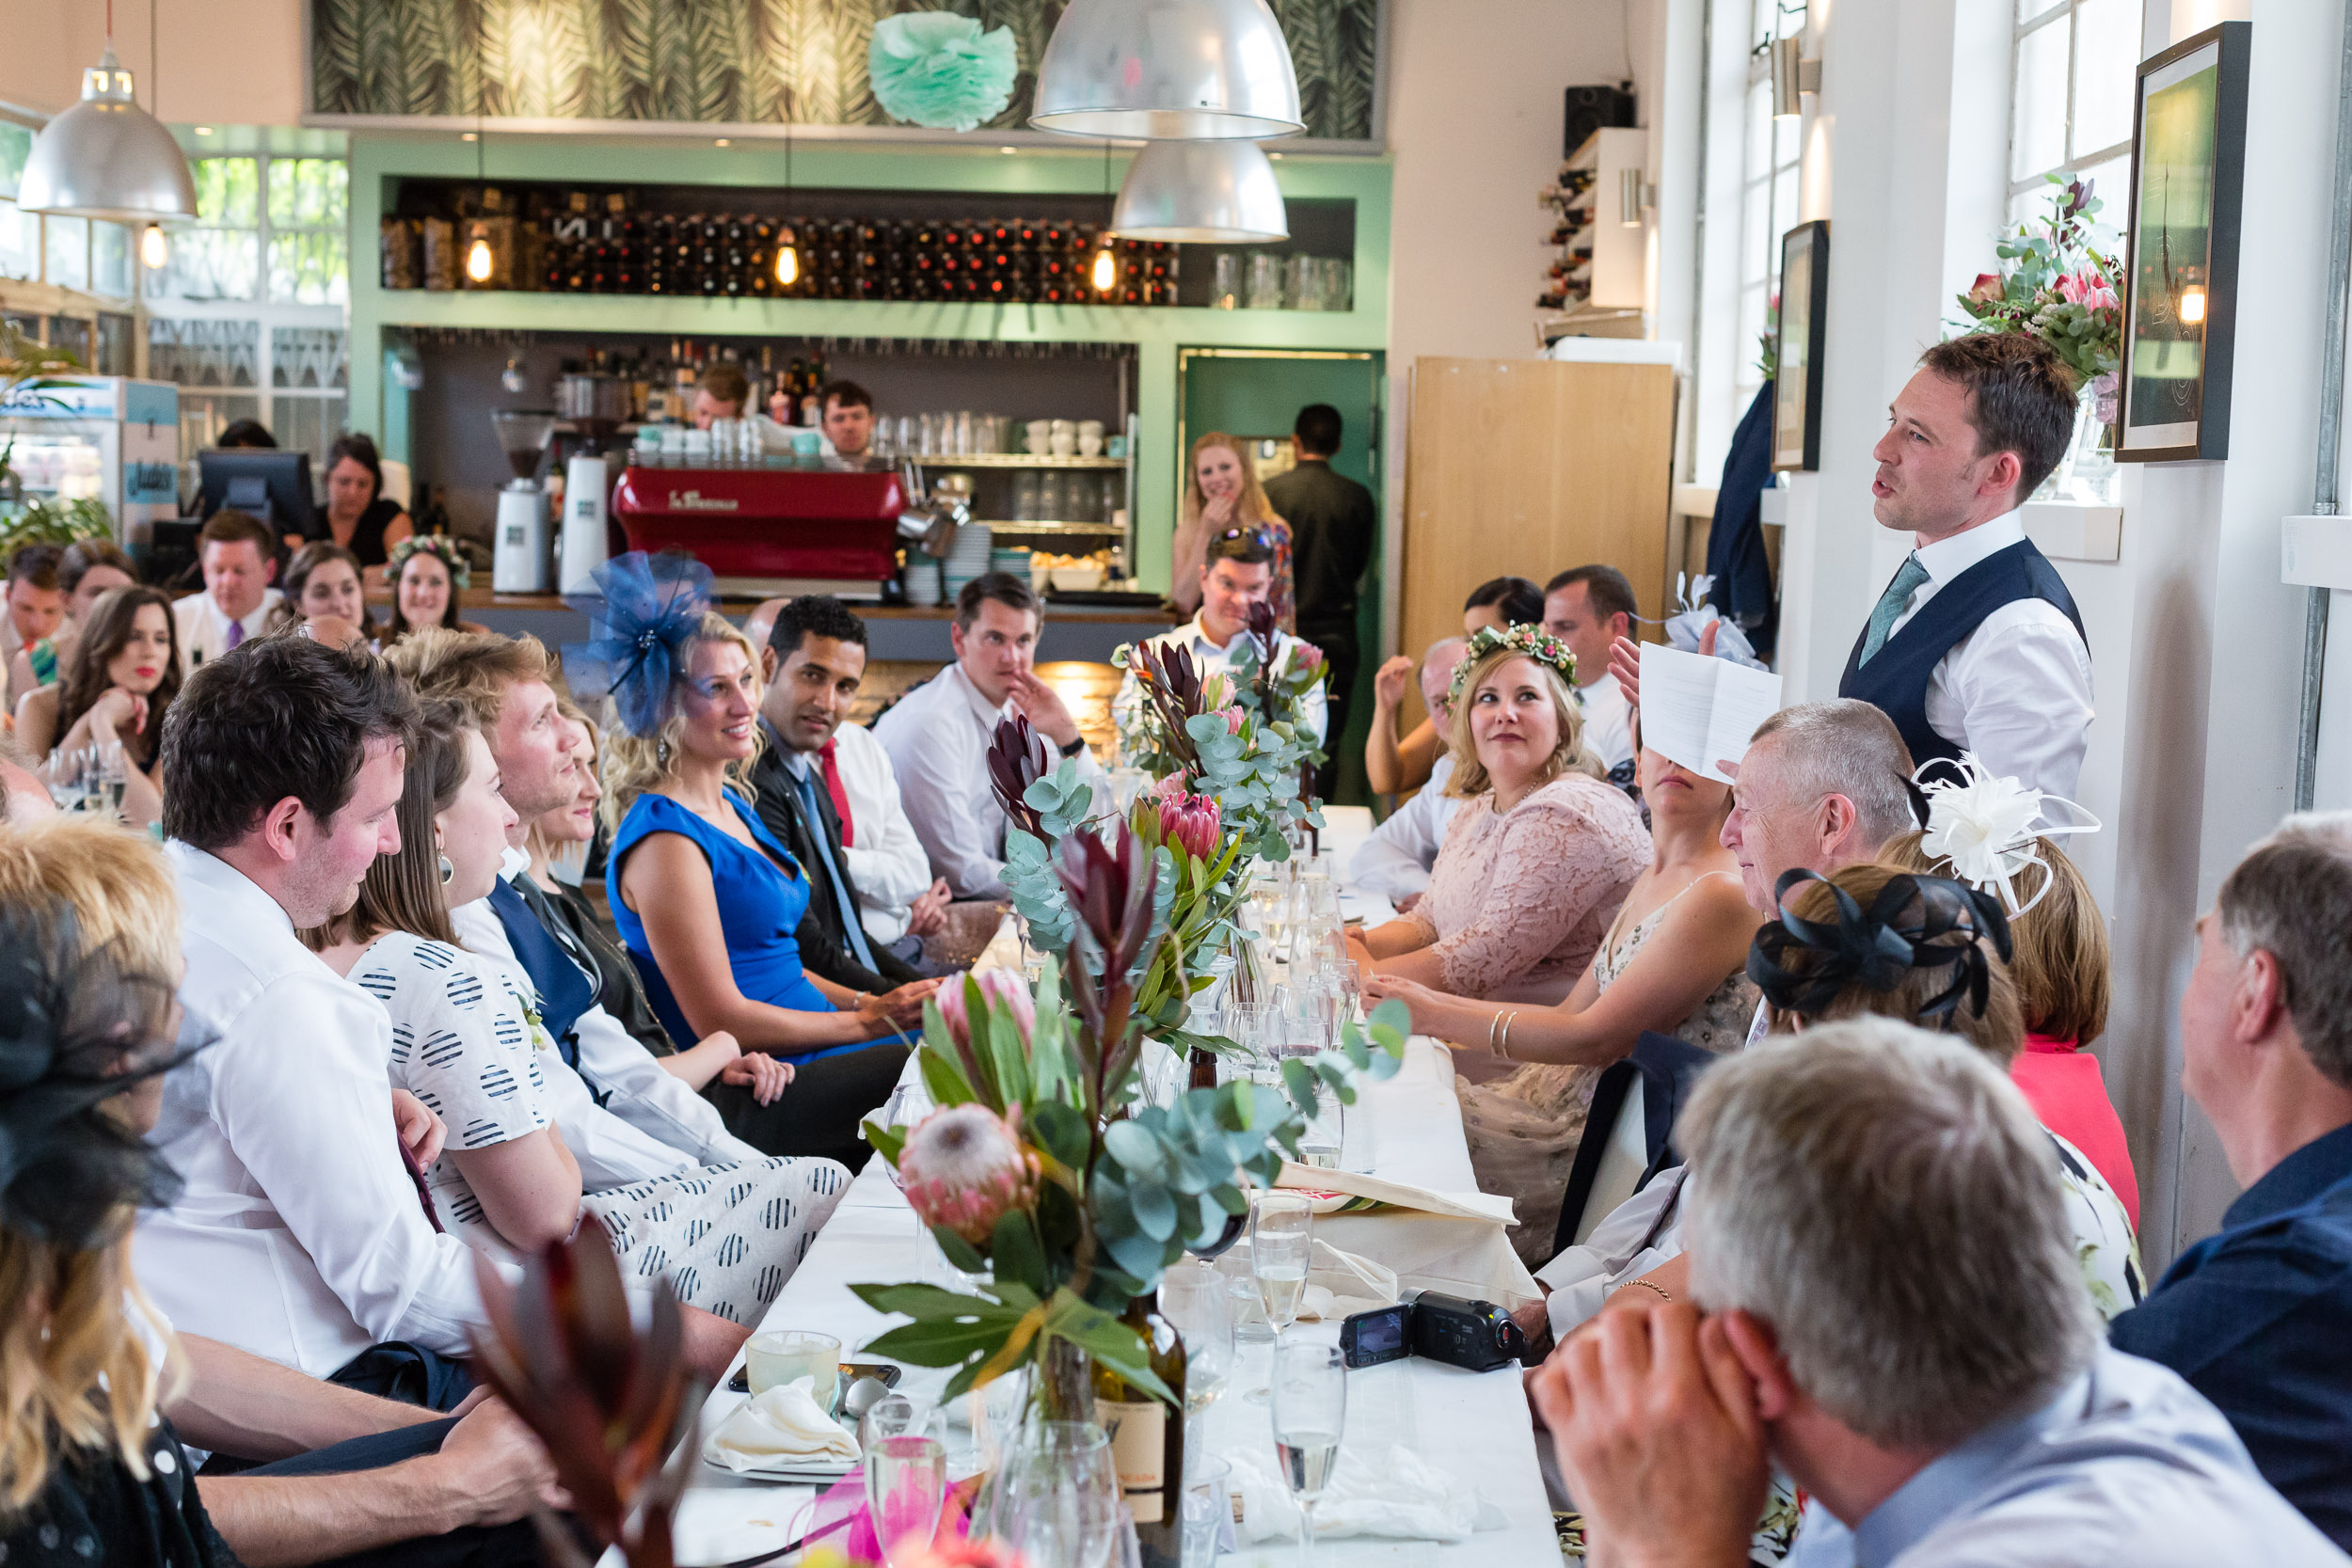 brockwell-lido-brixton-herne-hill-wedding-350.jpg